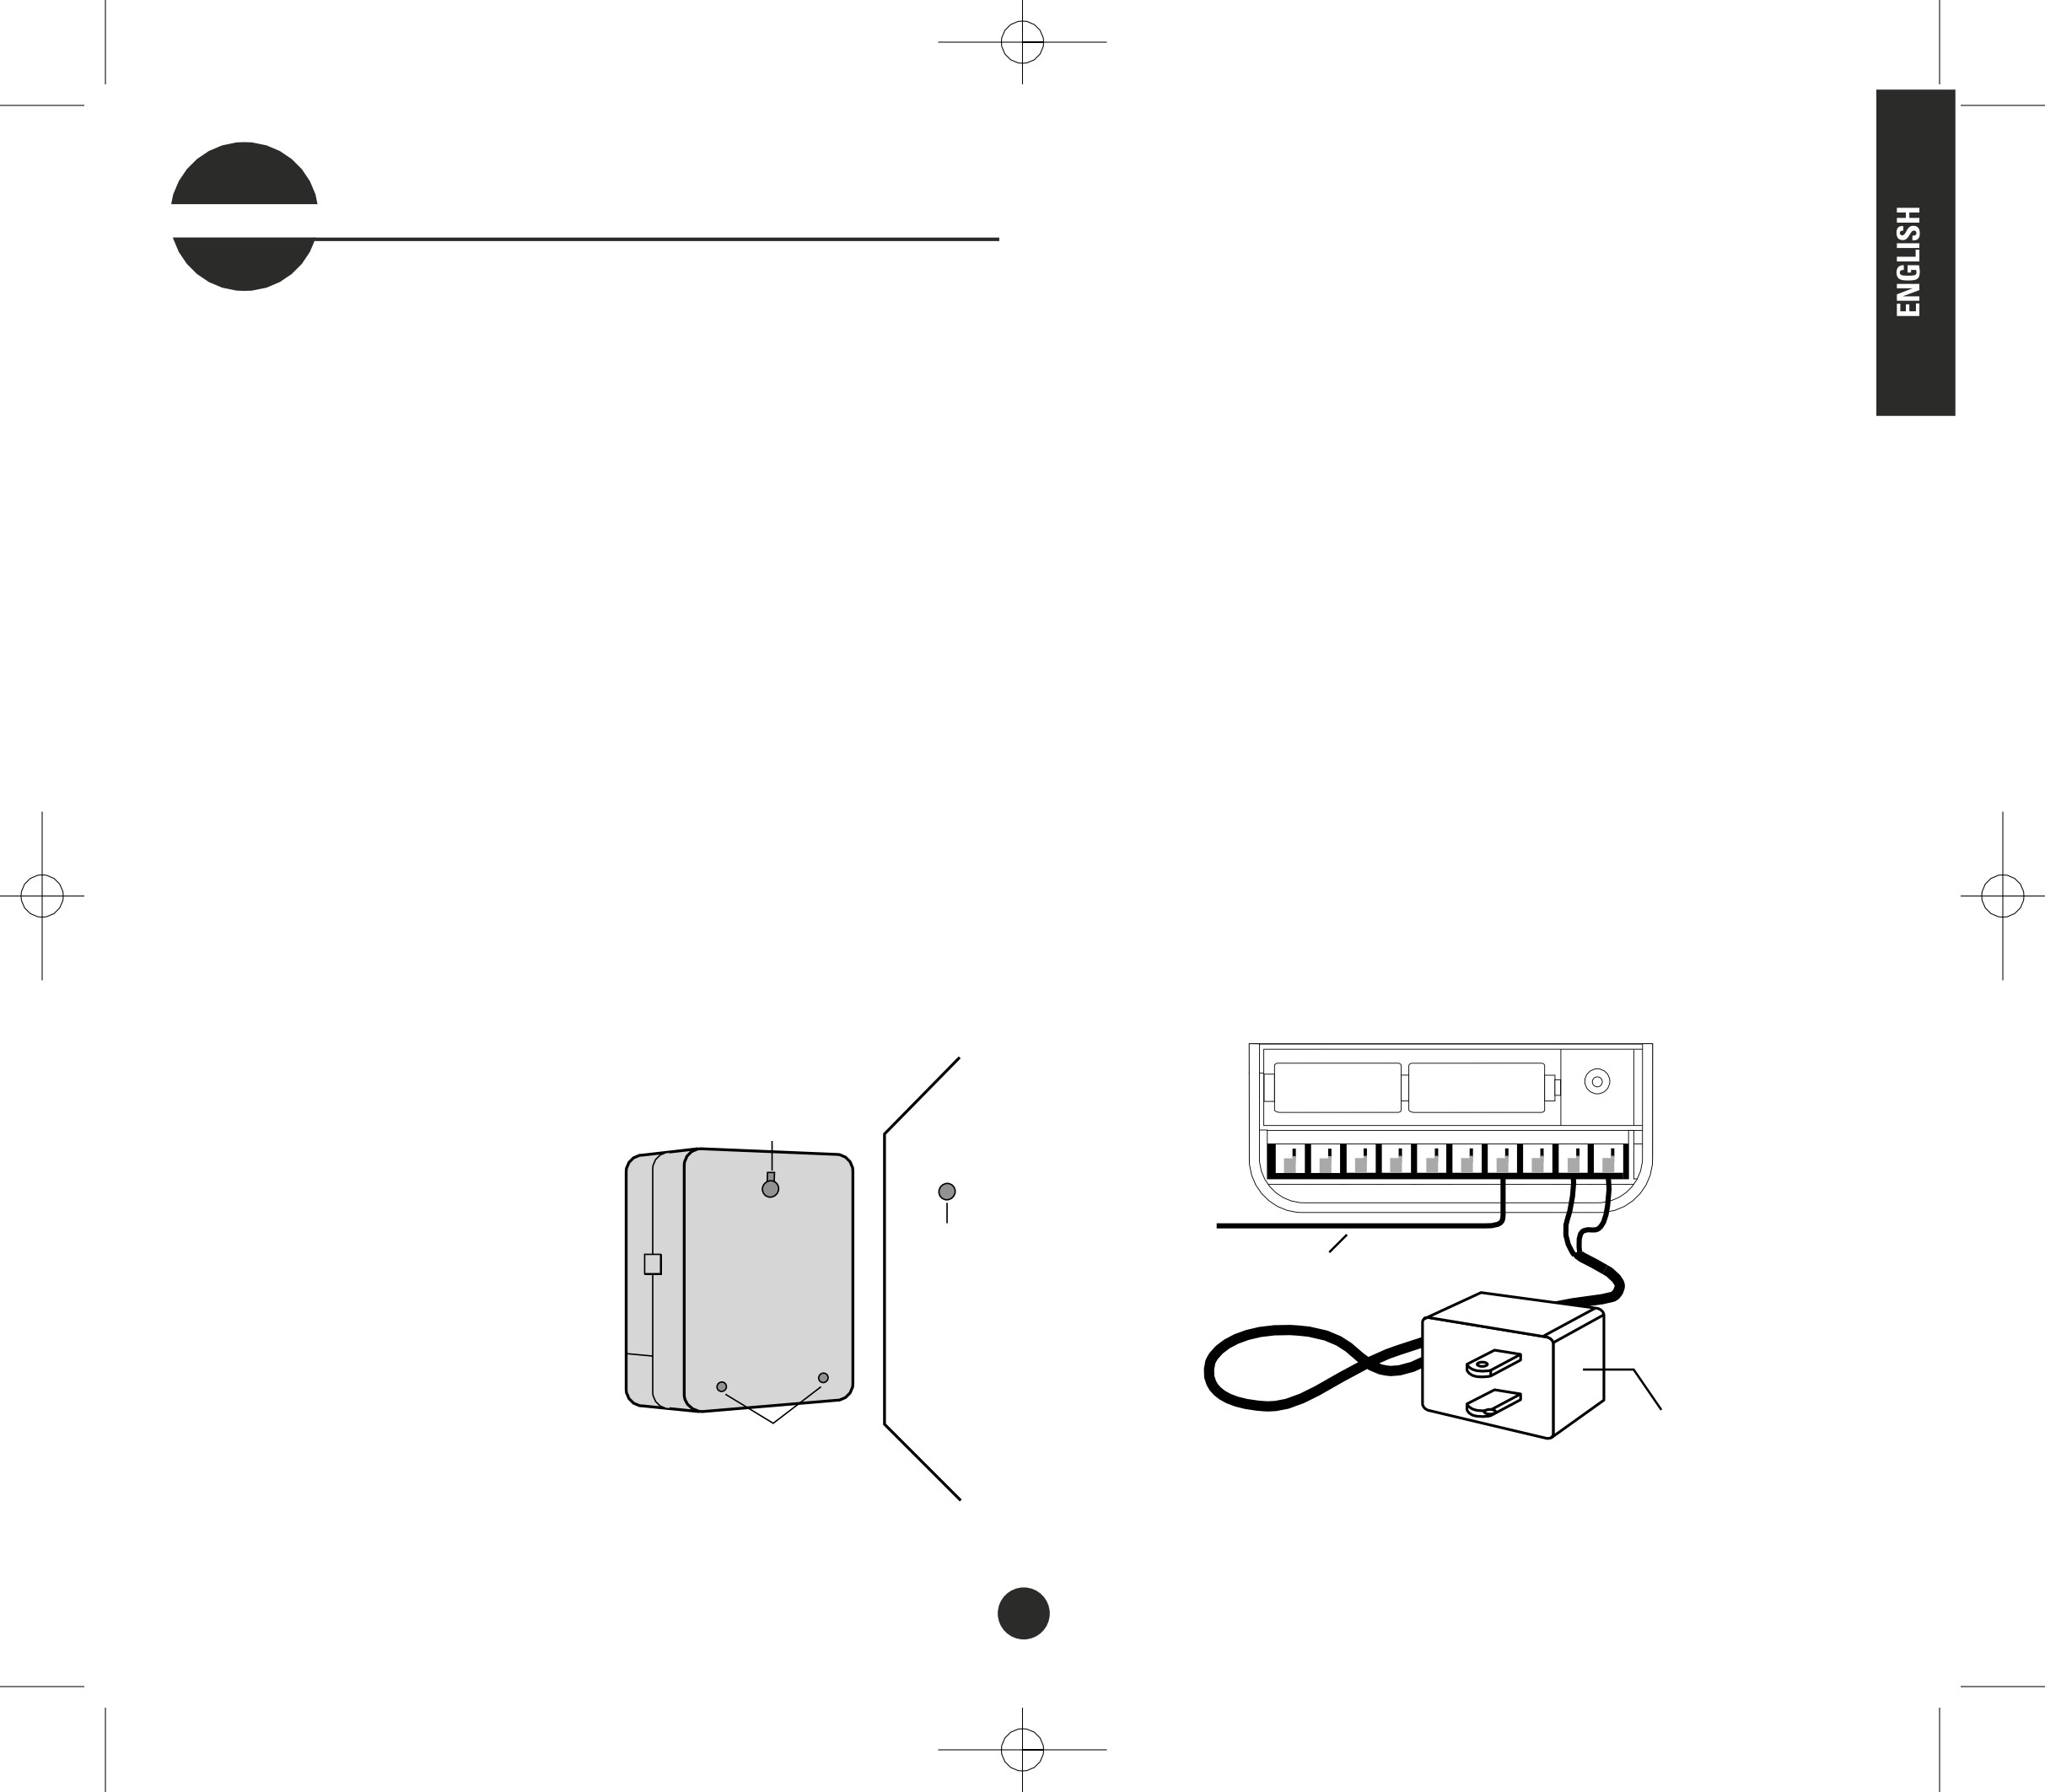 Irrigation Hr Products Controllers Orbit Pluscd2 Pump Start Relay Wiring Diagram Wtm210728 57004 24 Rdqx